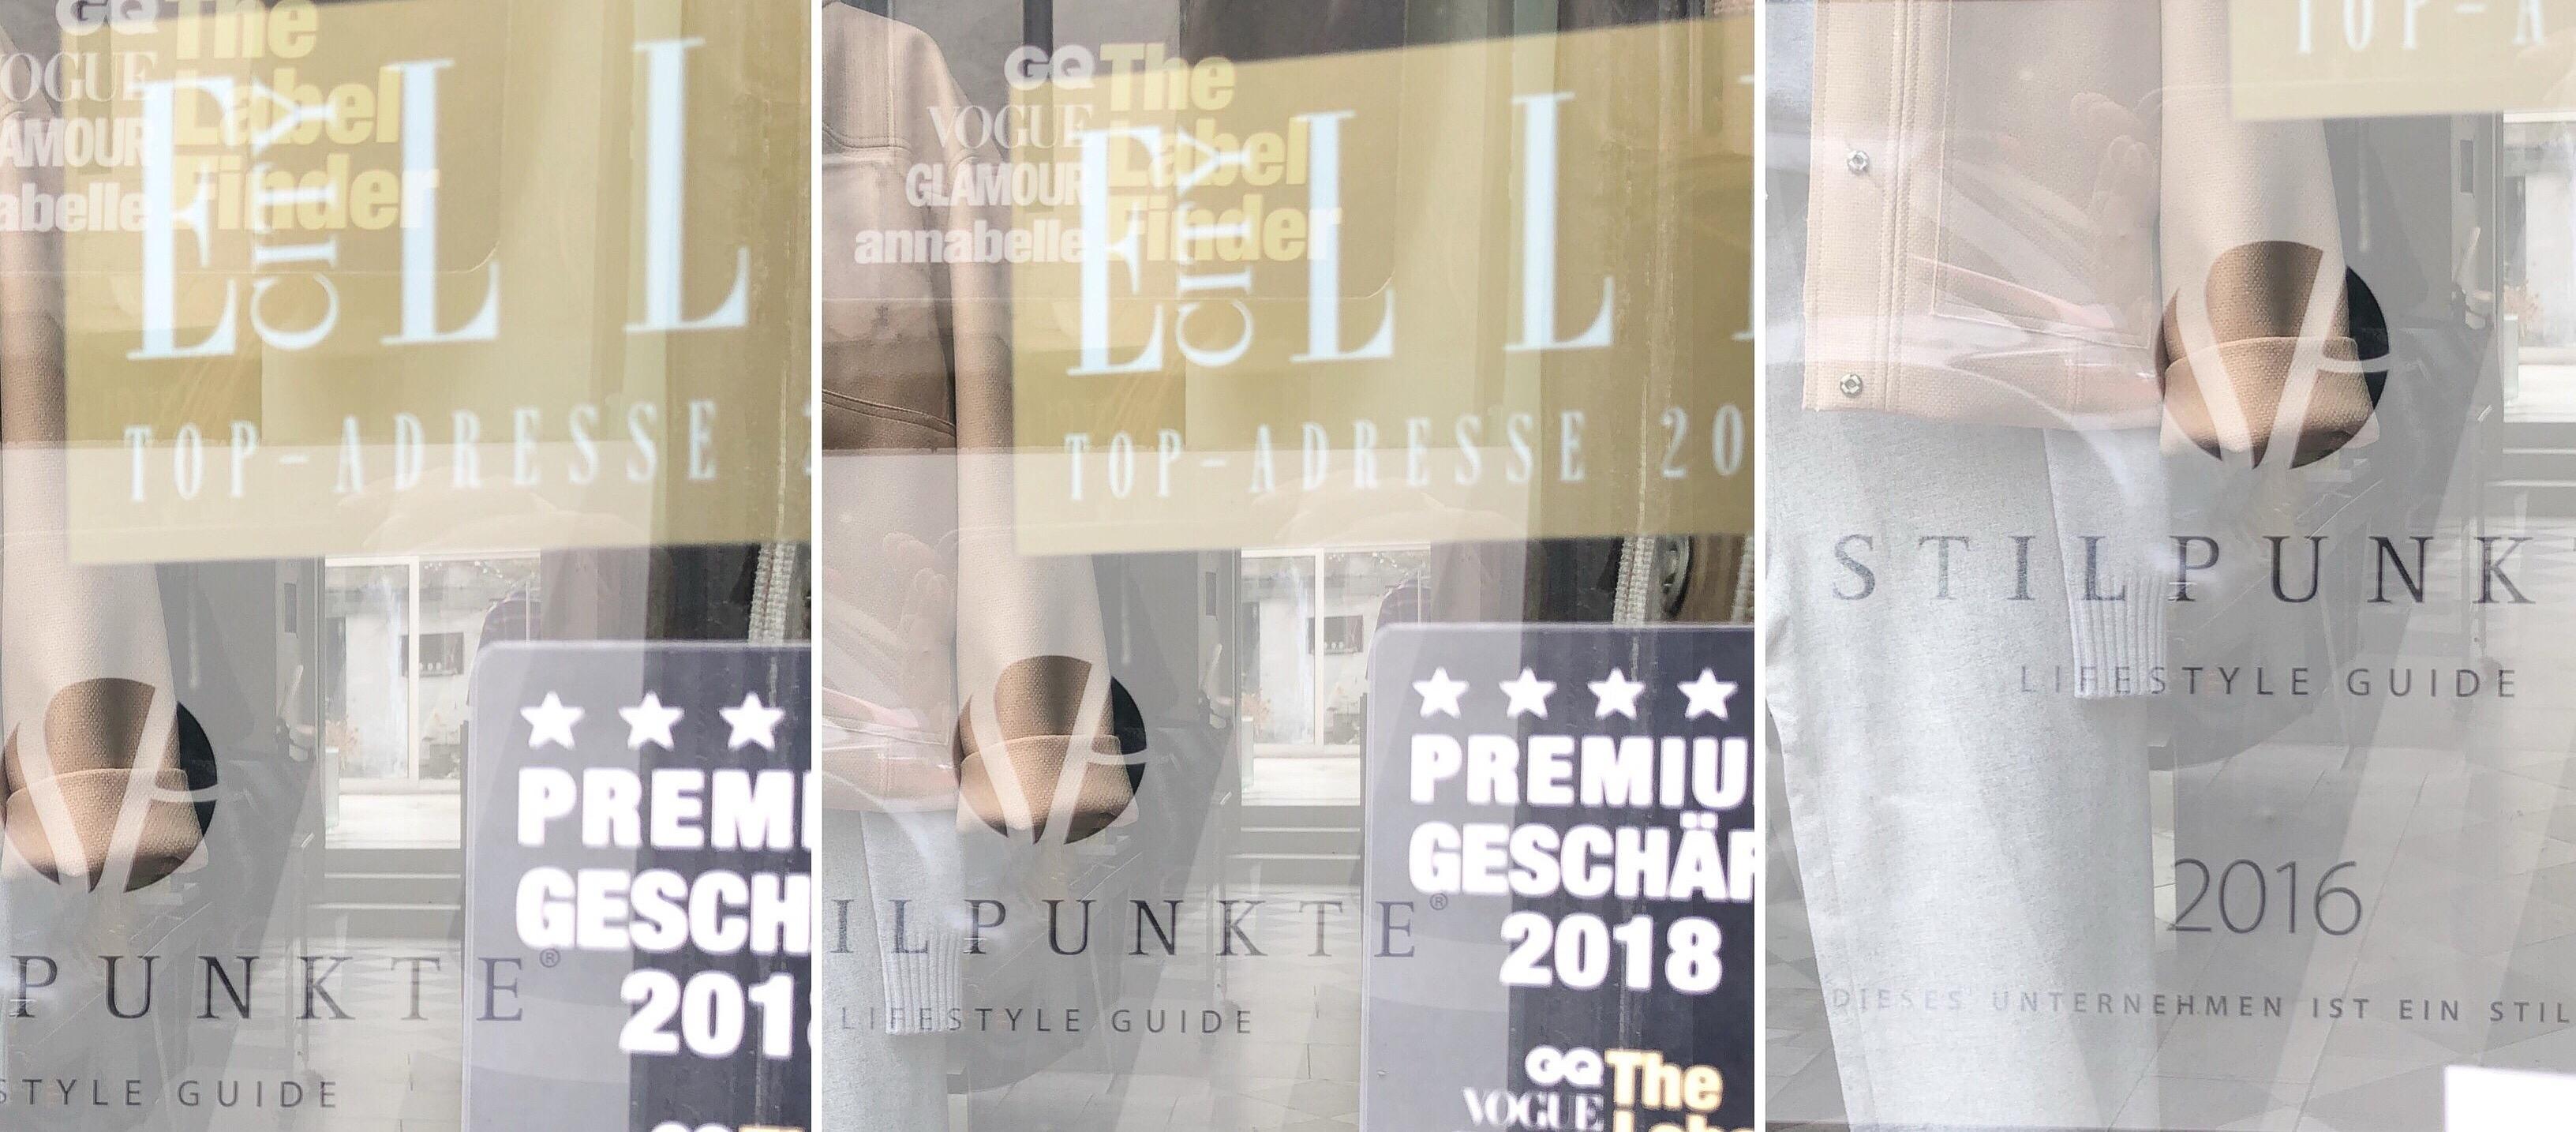 Presse Mode Boutique Köln.JPG